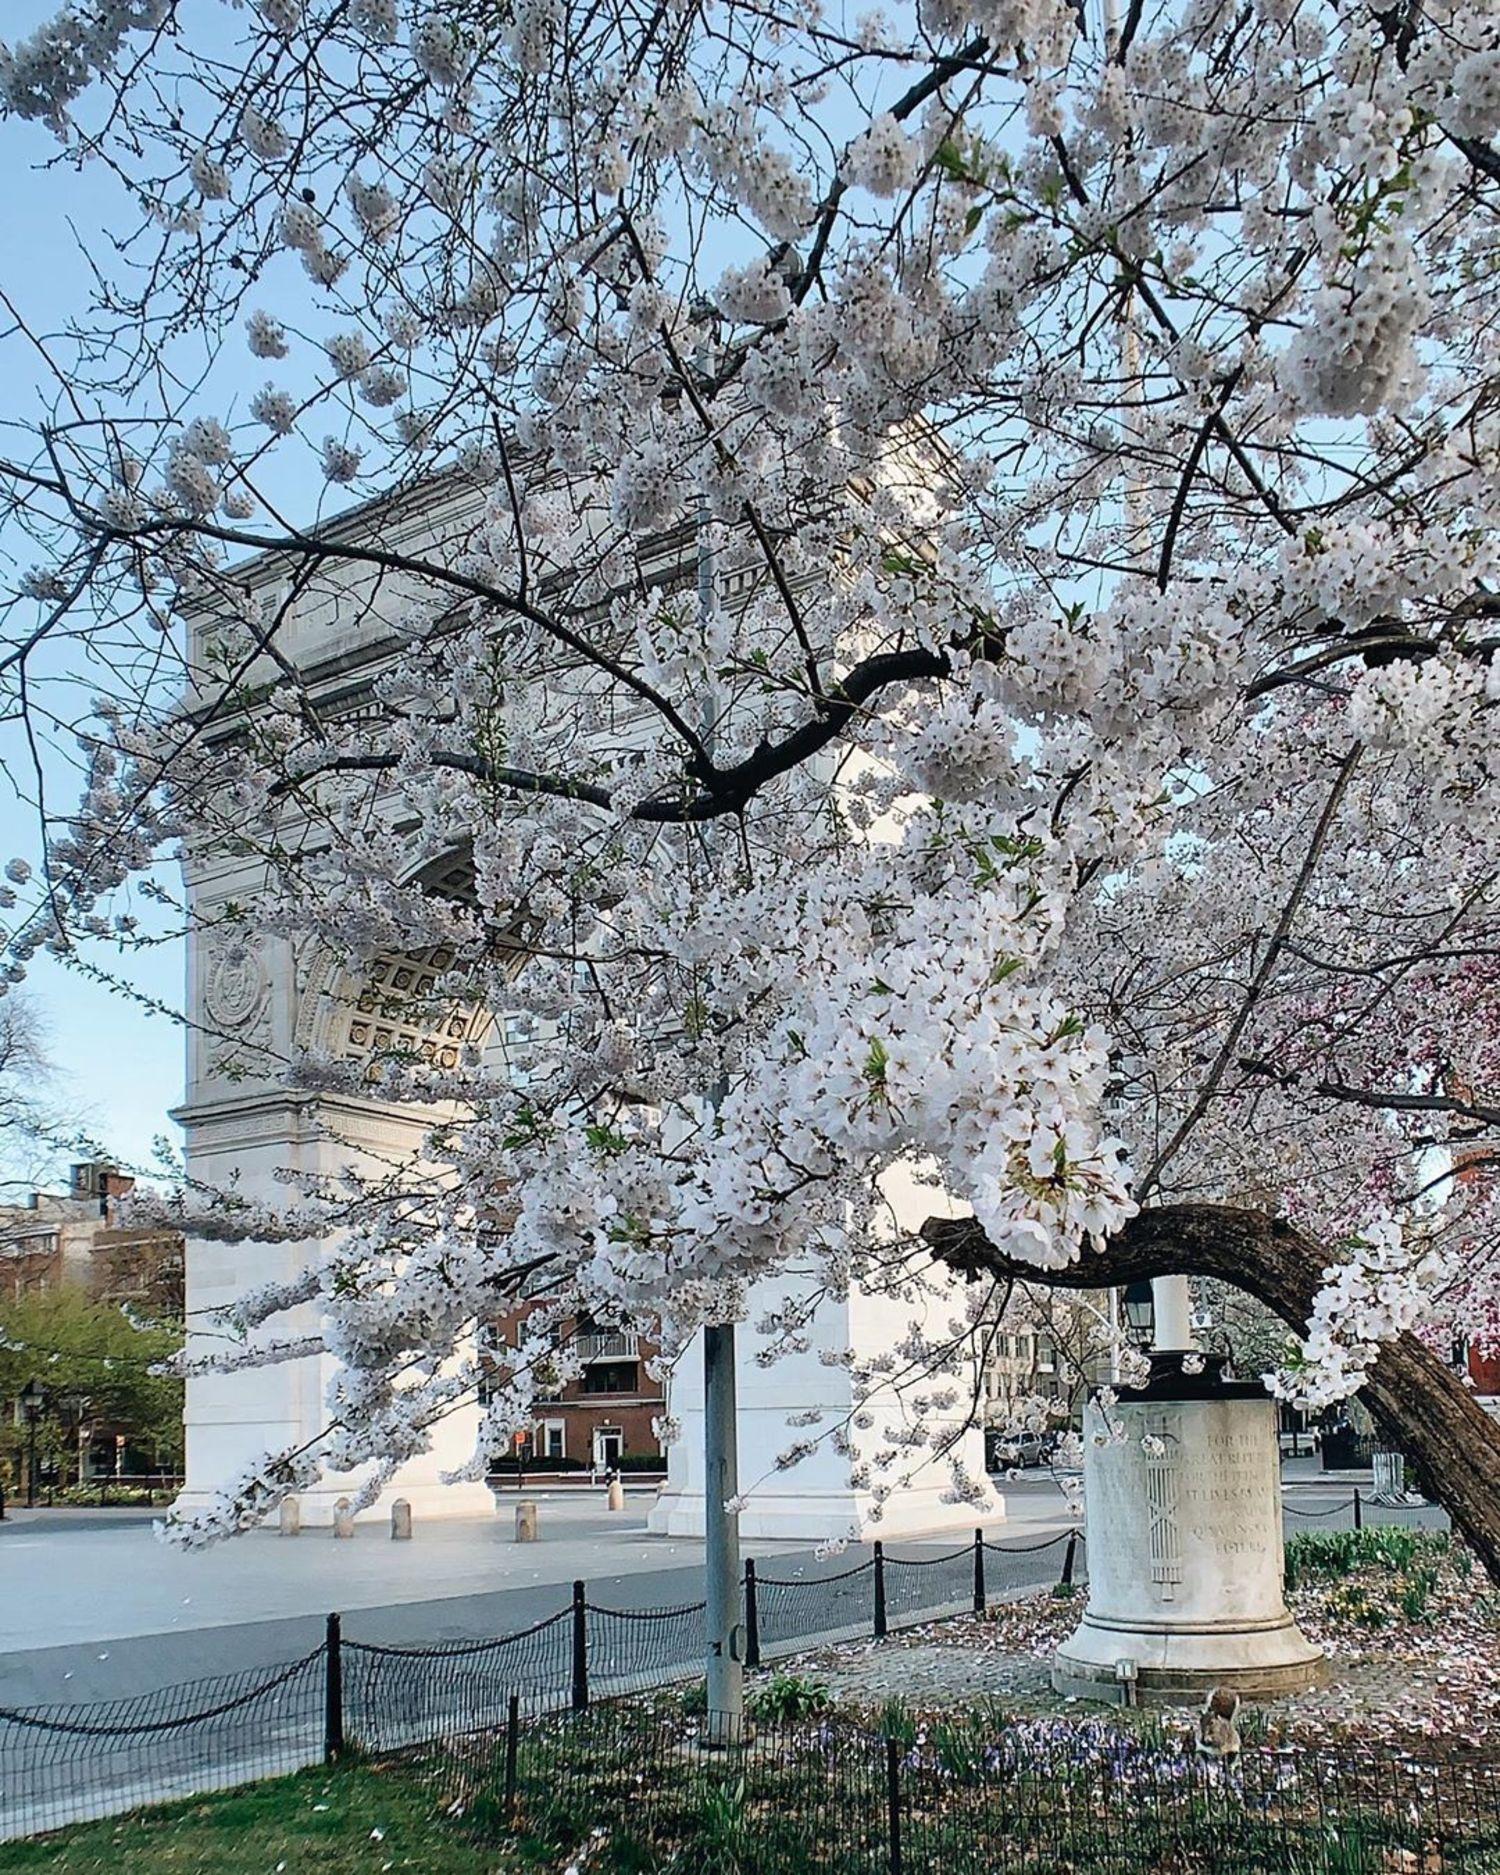 Washington Square Park, Greenwich Village, New York